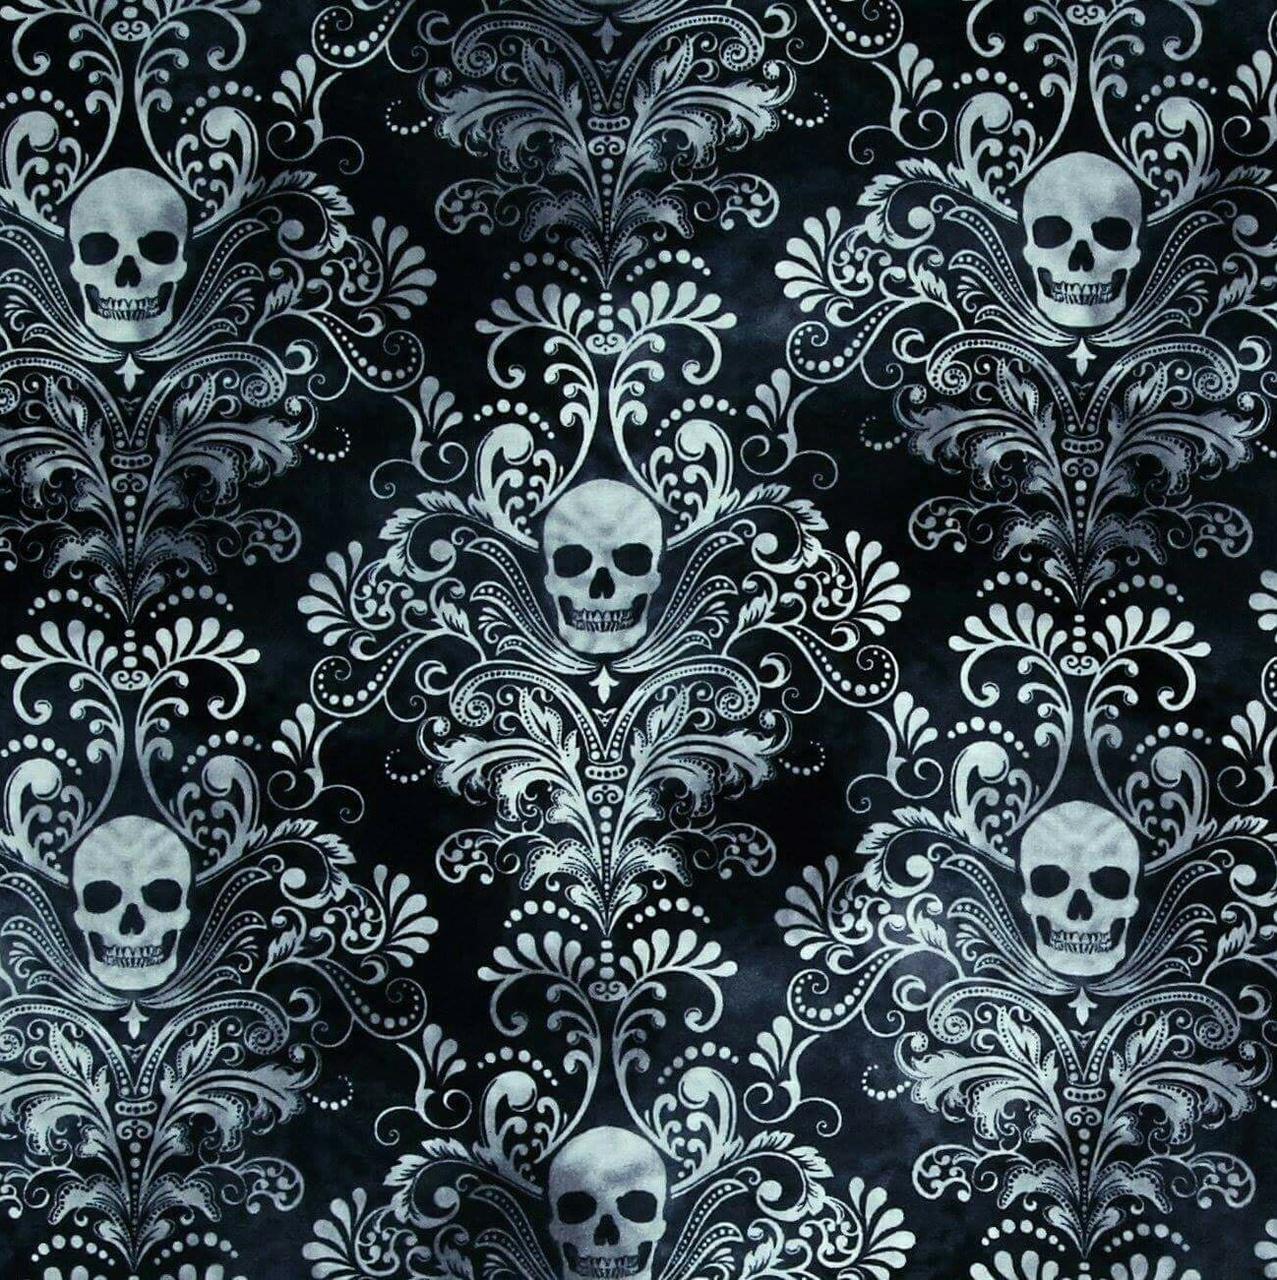 White Skull And Paisley Pattern On Black Wallpaper